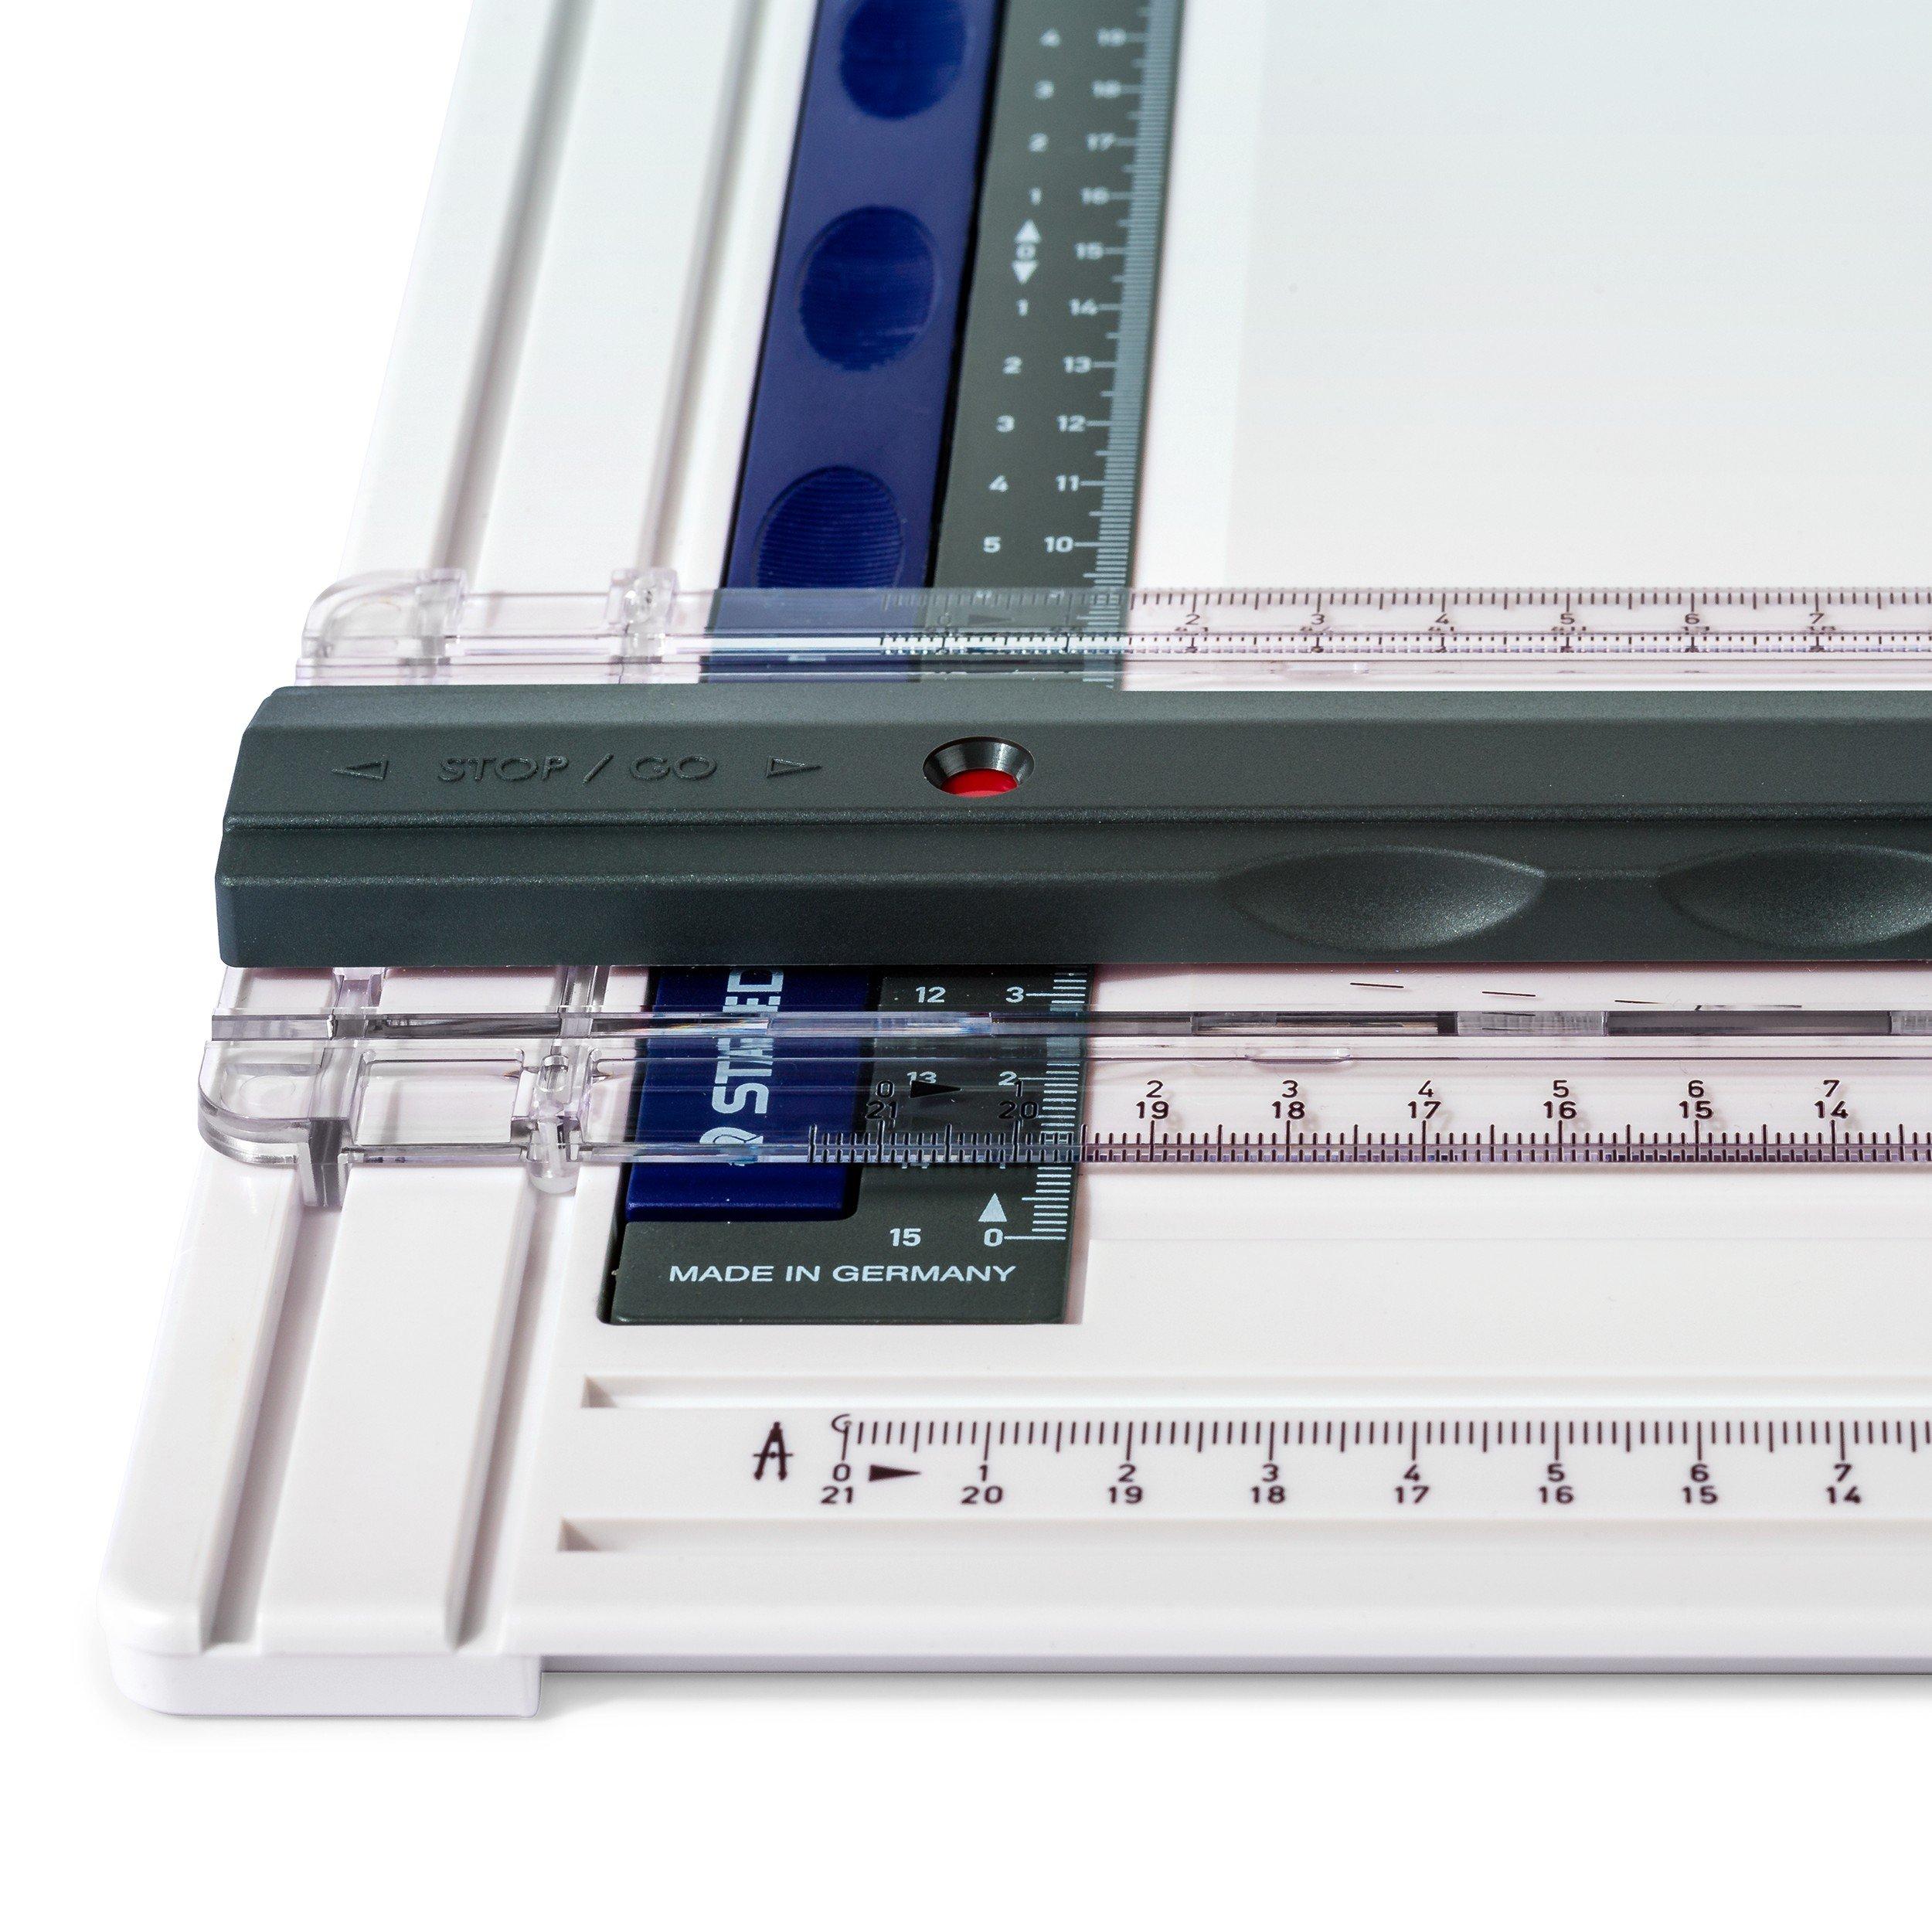 Staedtler 661A3PR1Drawing Board A3Promotion (Pigment Liner 308WP4) by STAEDTLER (Image #4)